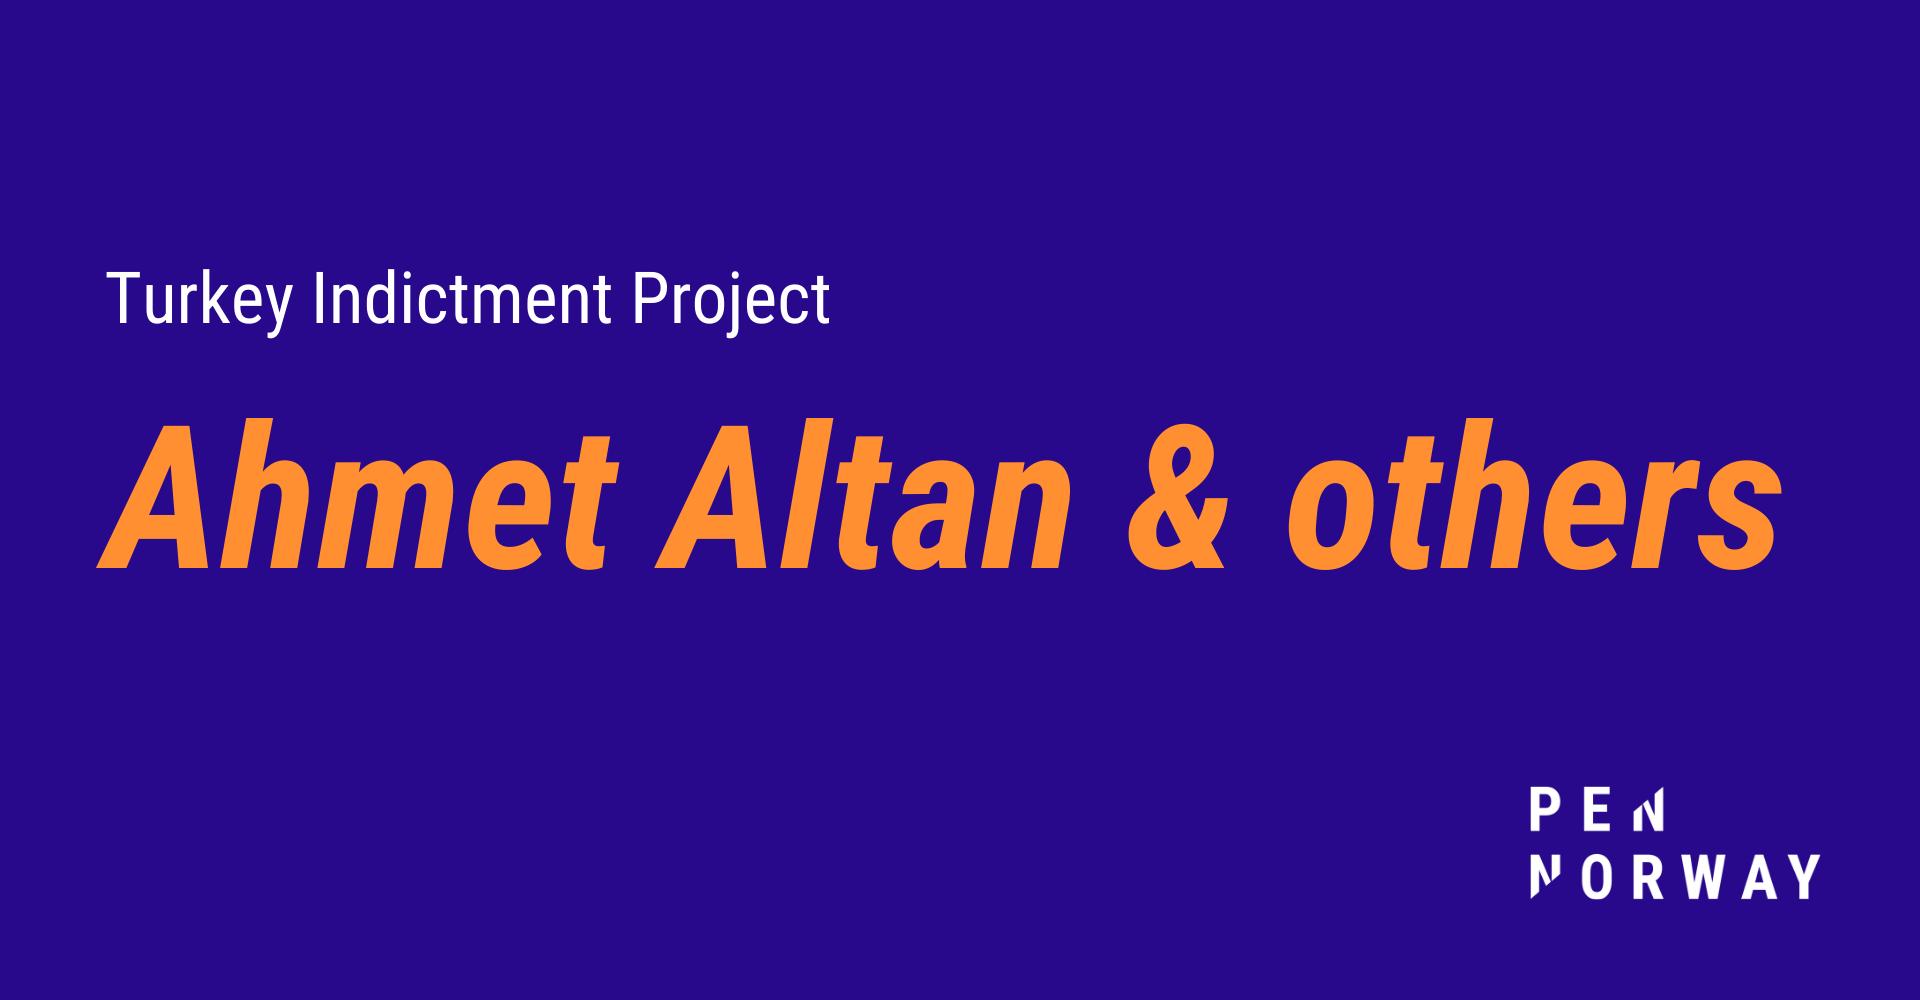 Indictment against writer Ahmet Altan examined